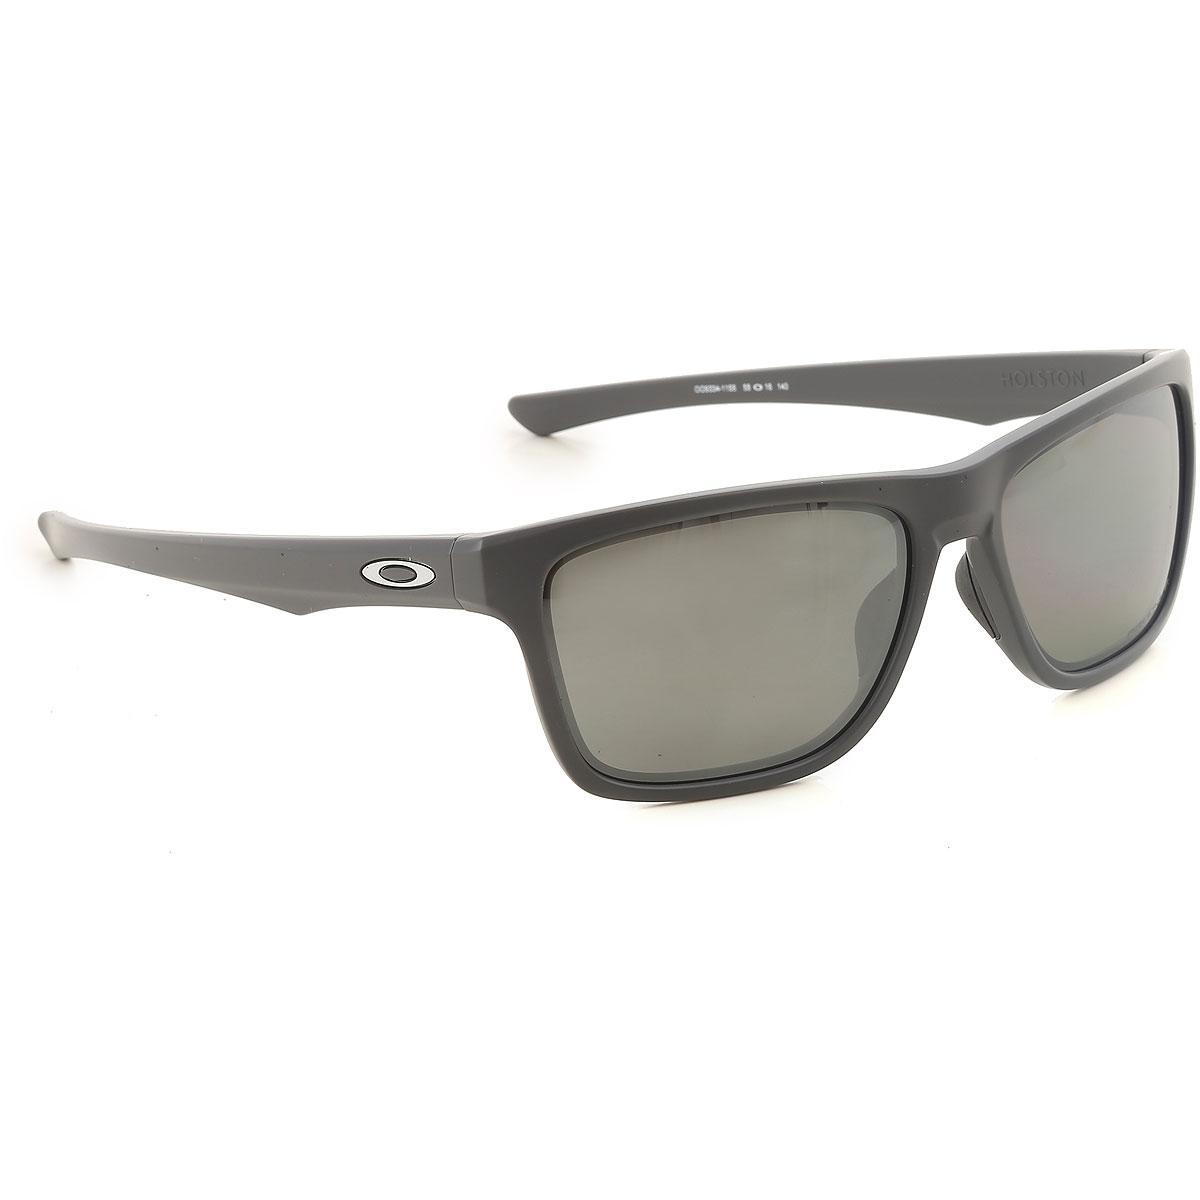 242440f1d7b57 Lyst - Gafas de Sol Baratos en Rebajas Oakley de hombre de color Gris